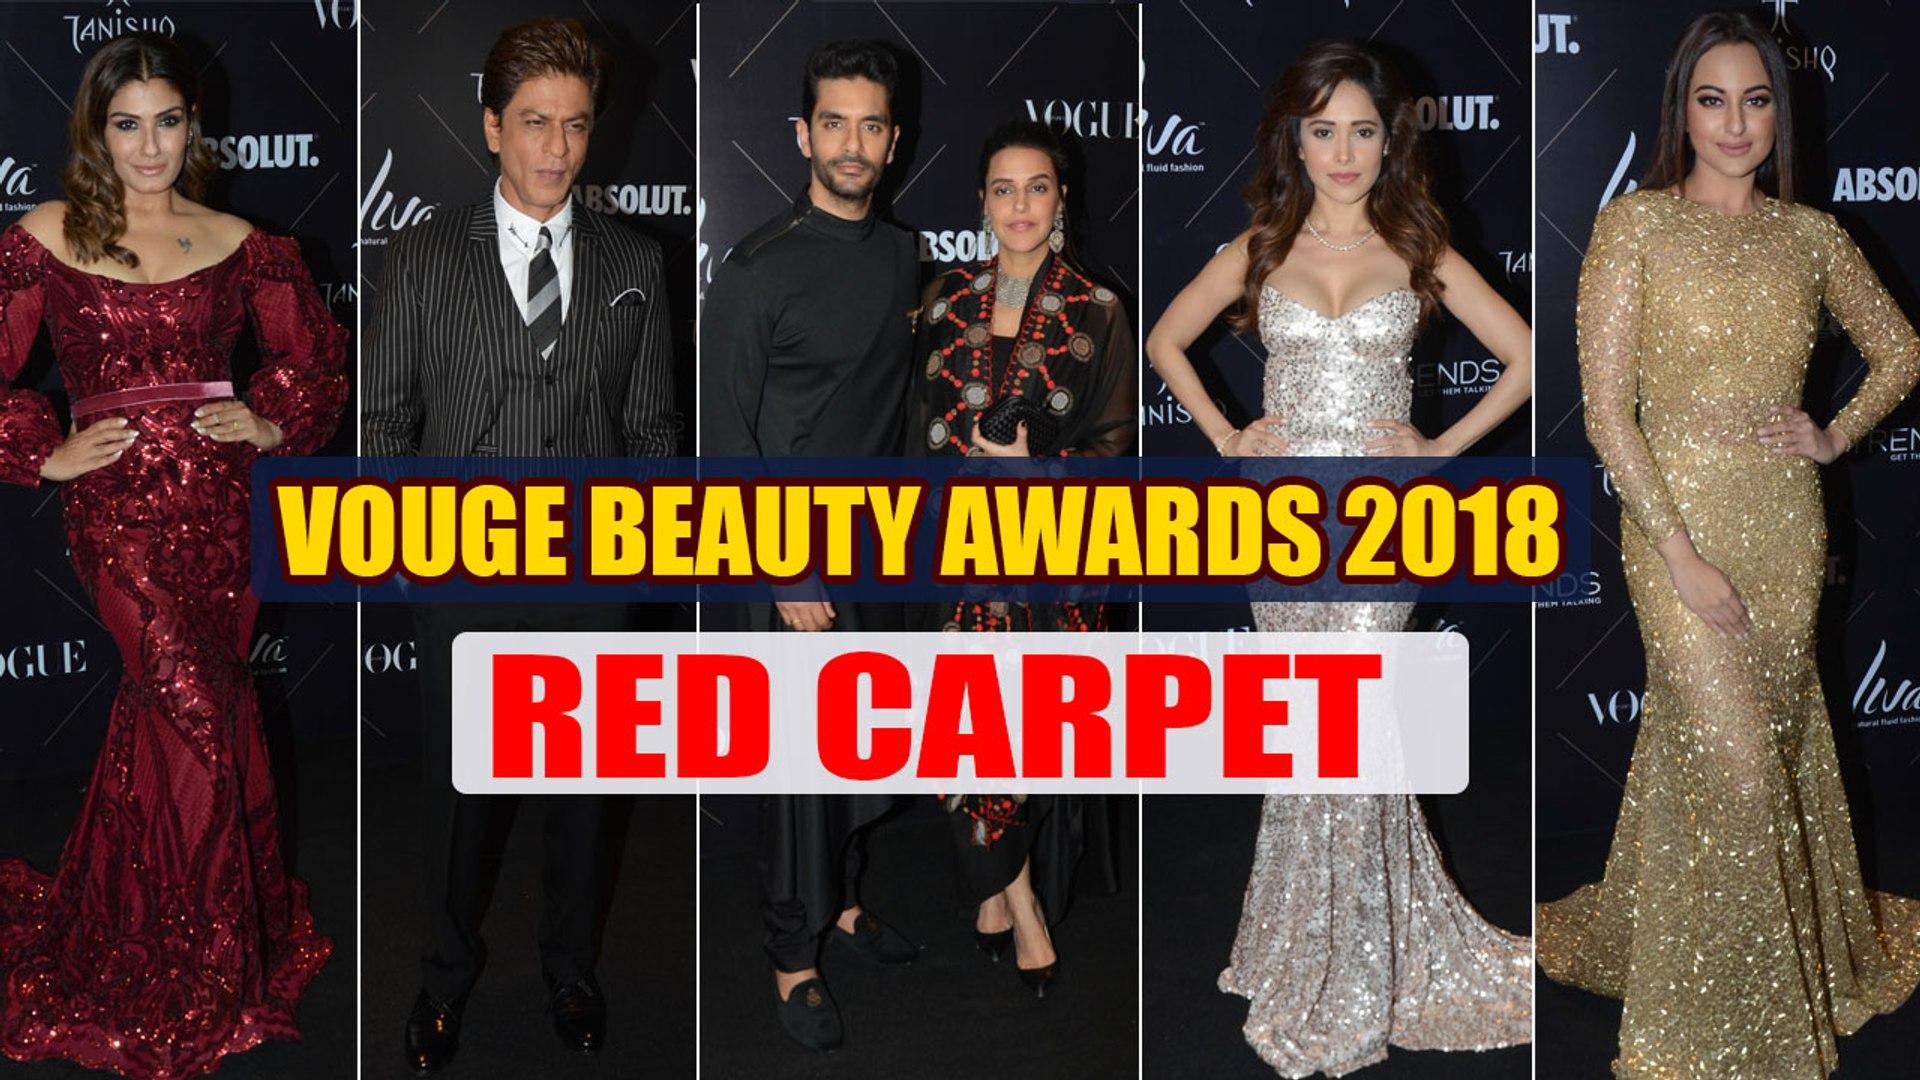 Vogue Beauty Awards 2018 Red Carpet UNCUT: Shahrukh, Vidya Balan, Manushi & others attend ।Filmi